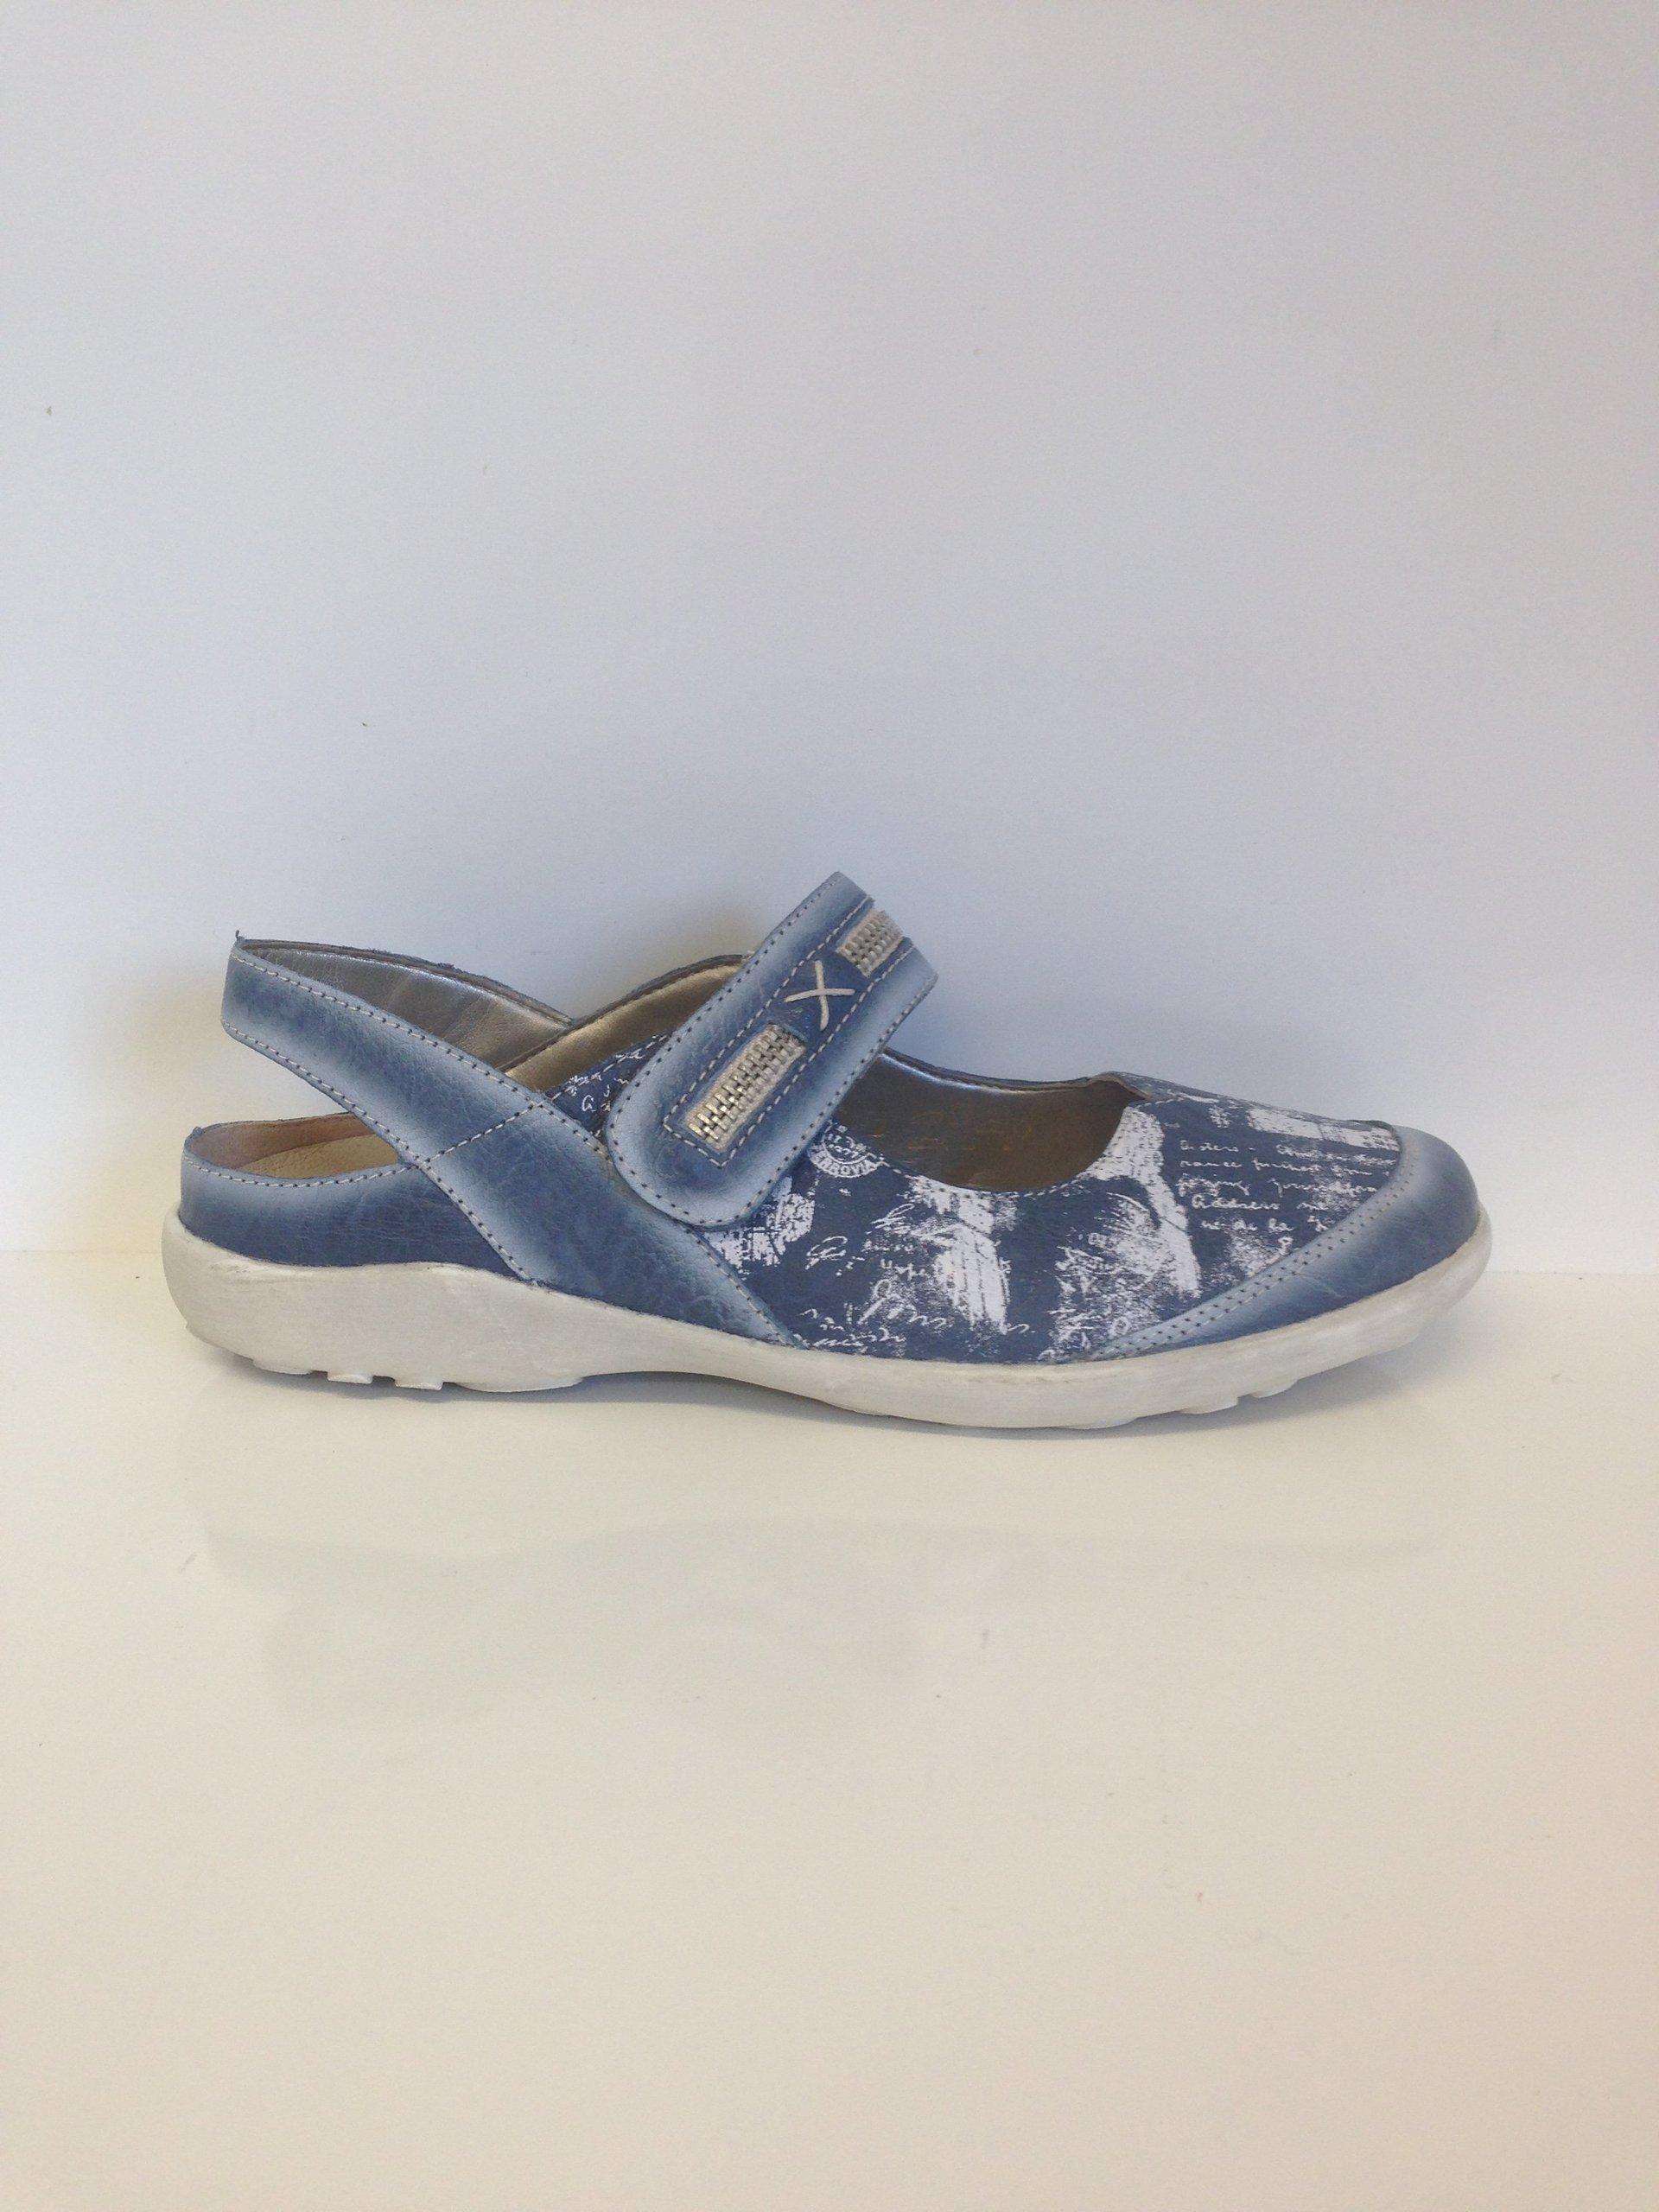 Stegmann Shoe Comfort Reviews